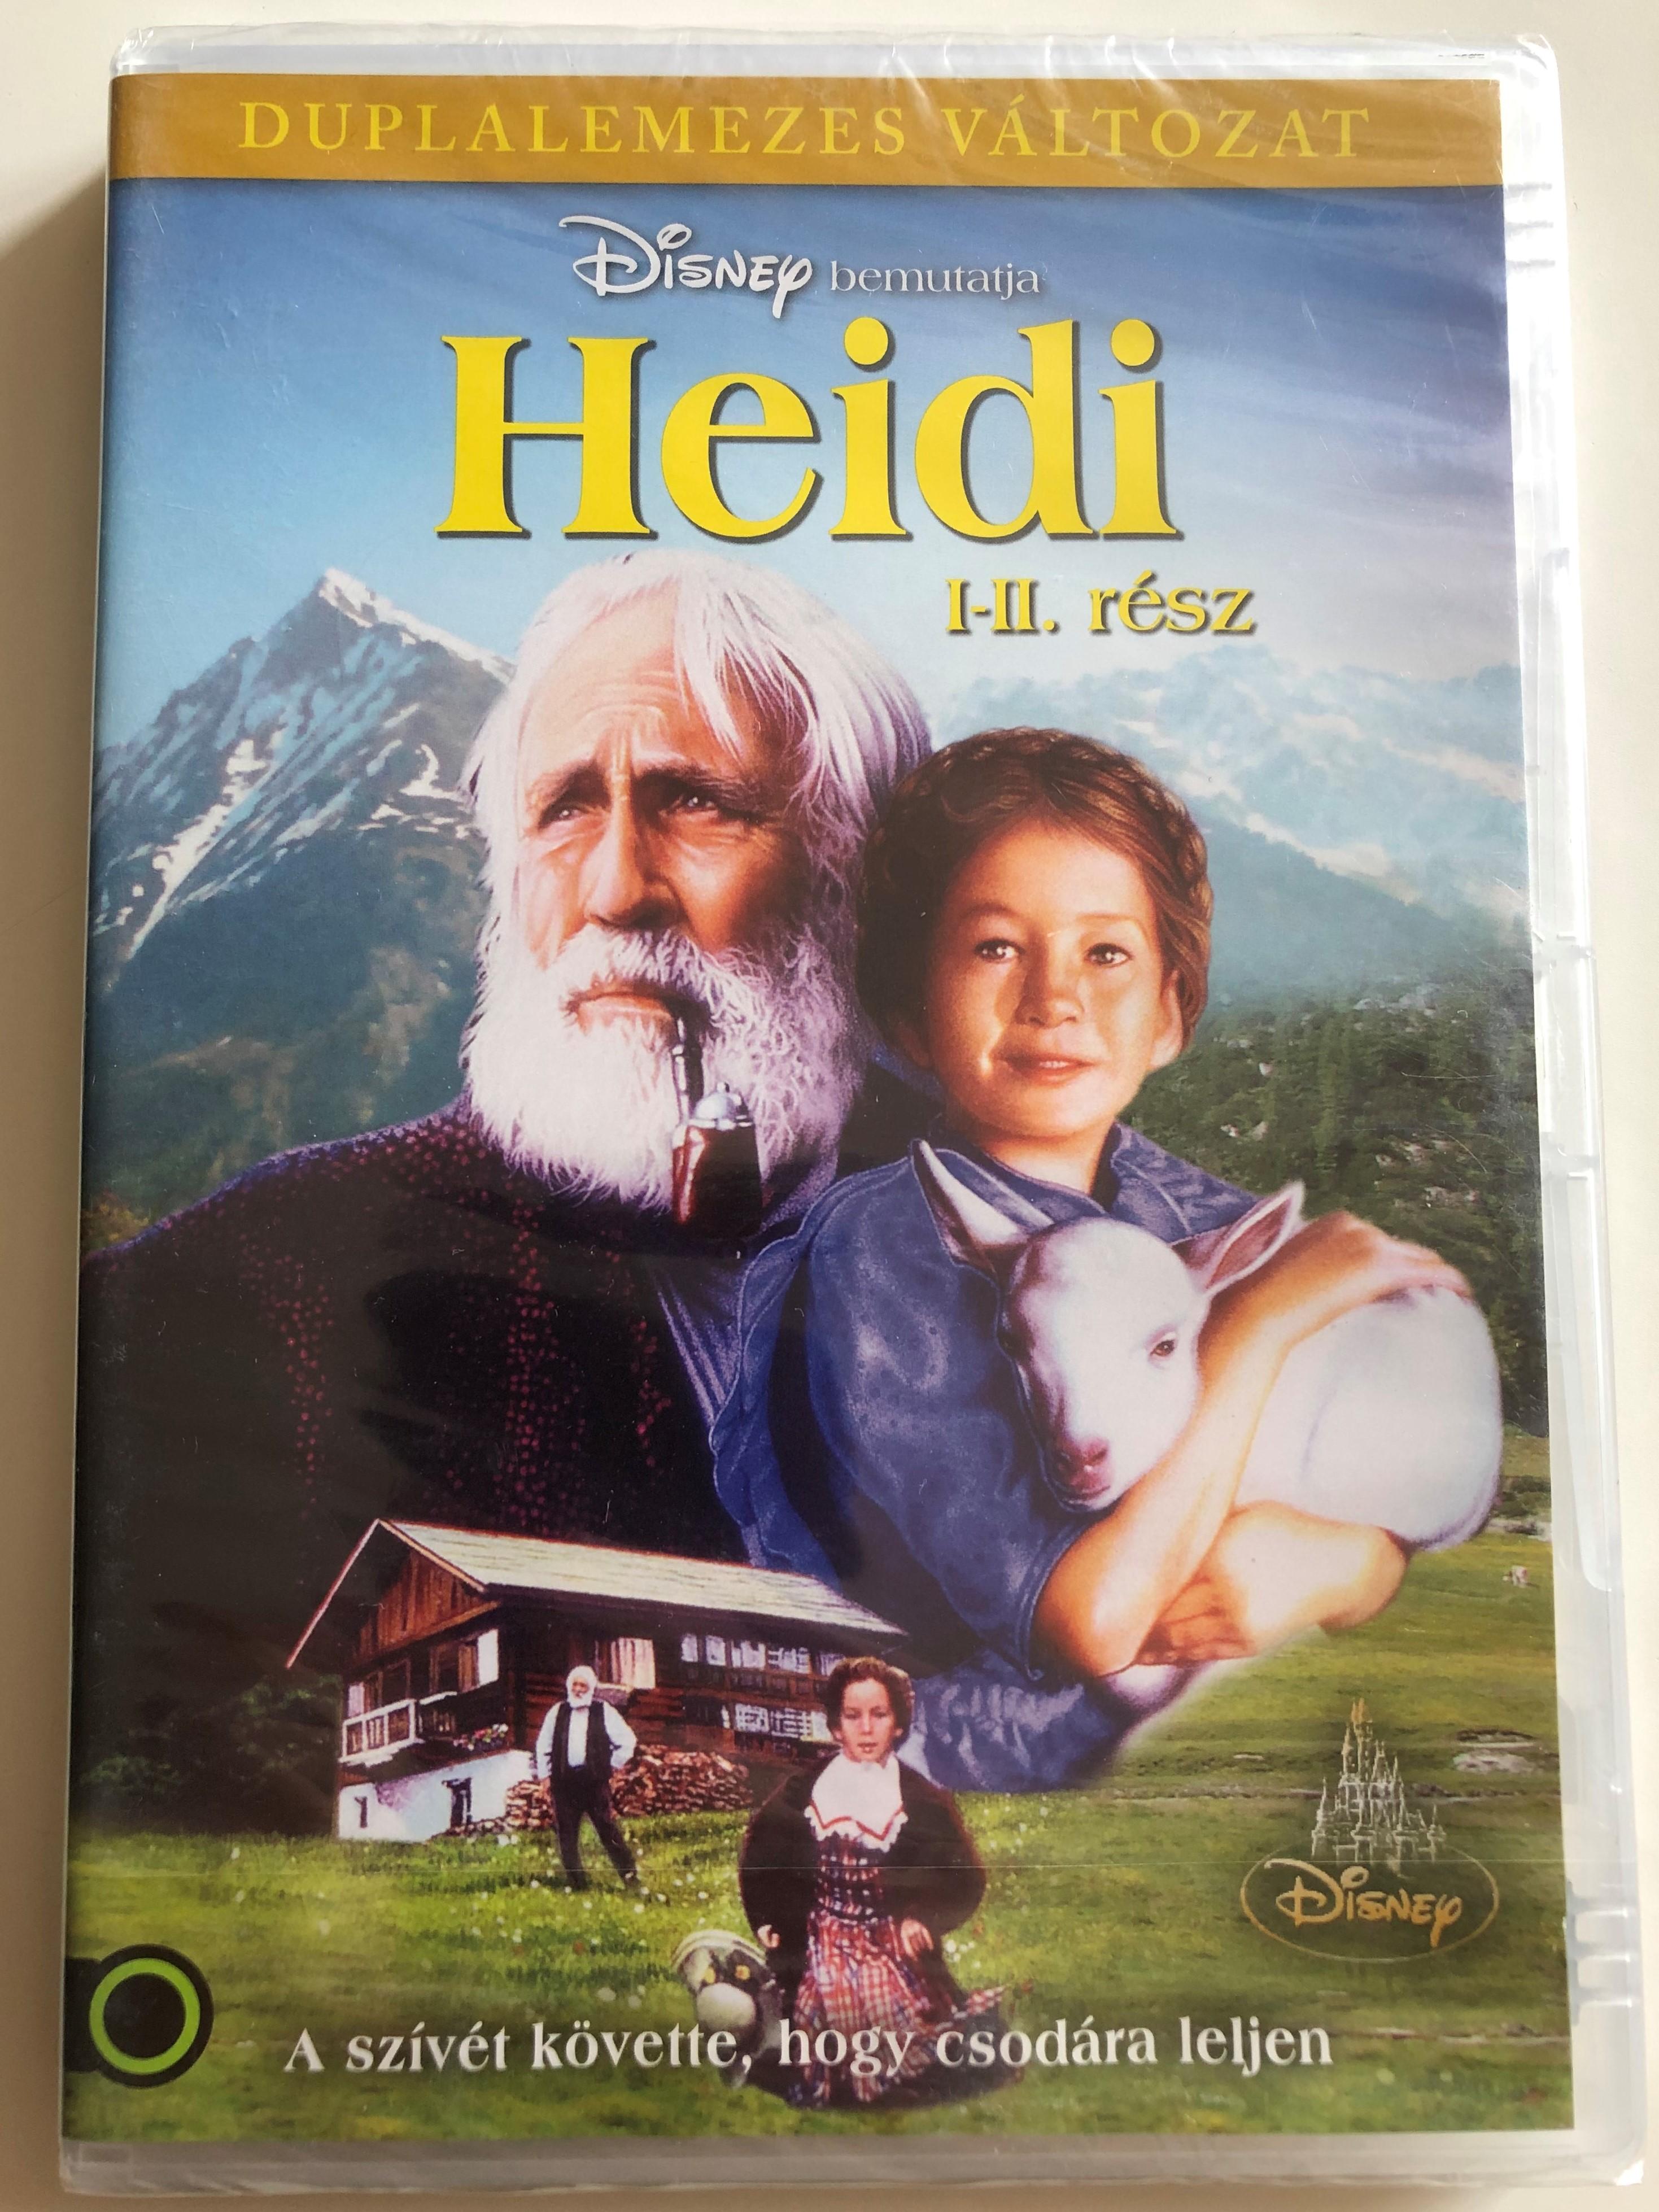 heidi-i-ii.-dvd-1993-a-sz-v-t-k-vette-hogy-csod-ra-leljen-directed-by-michael-ray-rhodes-starring-noley-thornton-jason-robards-jane-seymour-jane-hazlegrove-ben-brazier-lexi-randall-american-tv-miniseries-1-.jpg